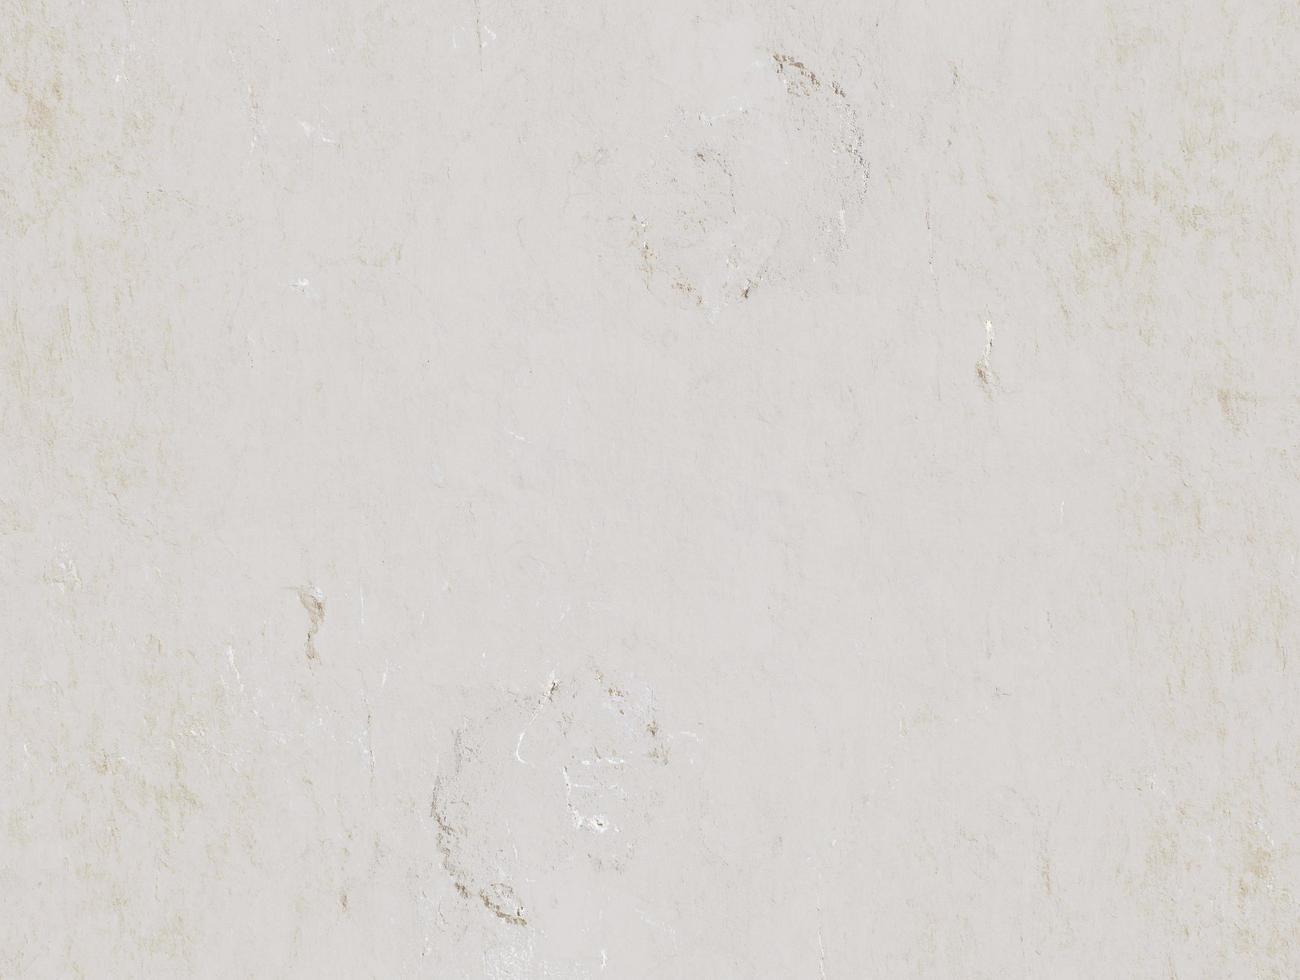 beige grunge vägg konsistens foto